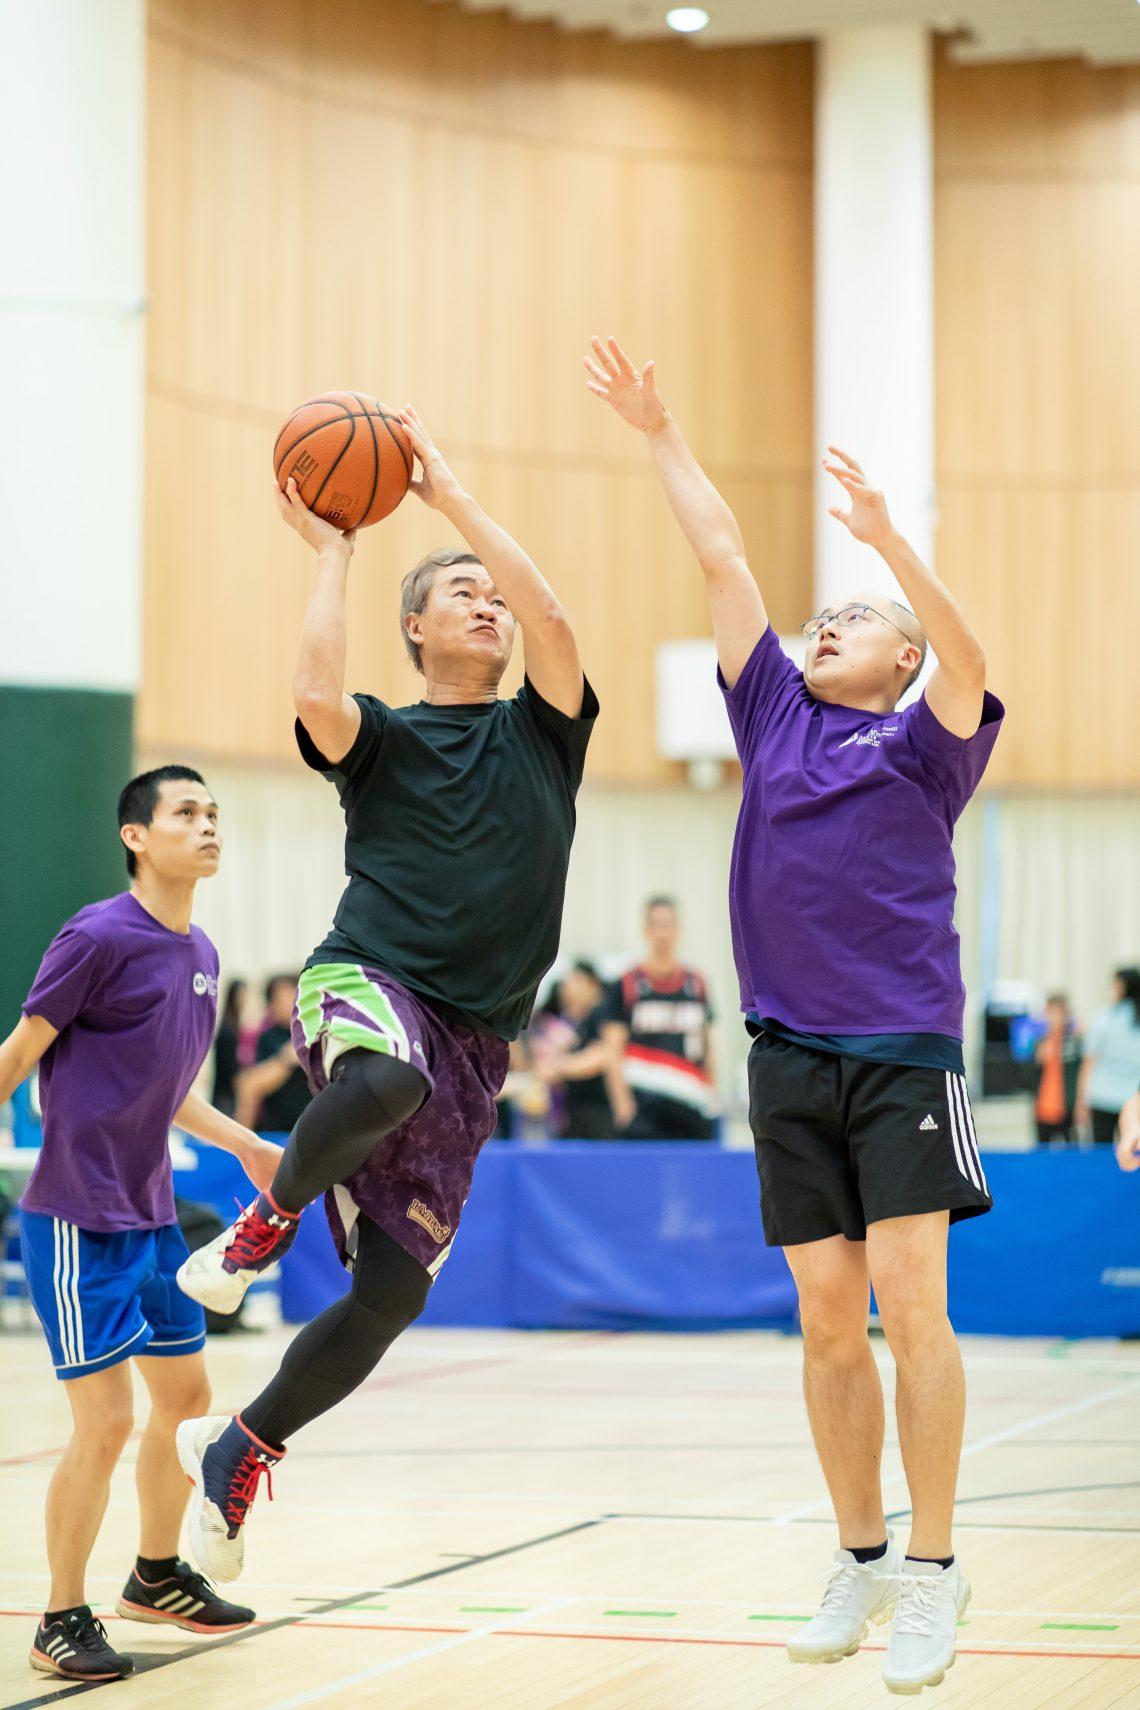 Men's 3-on-3 basketball tournament